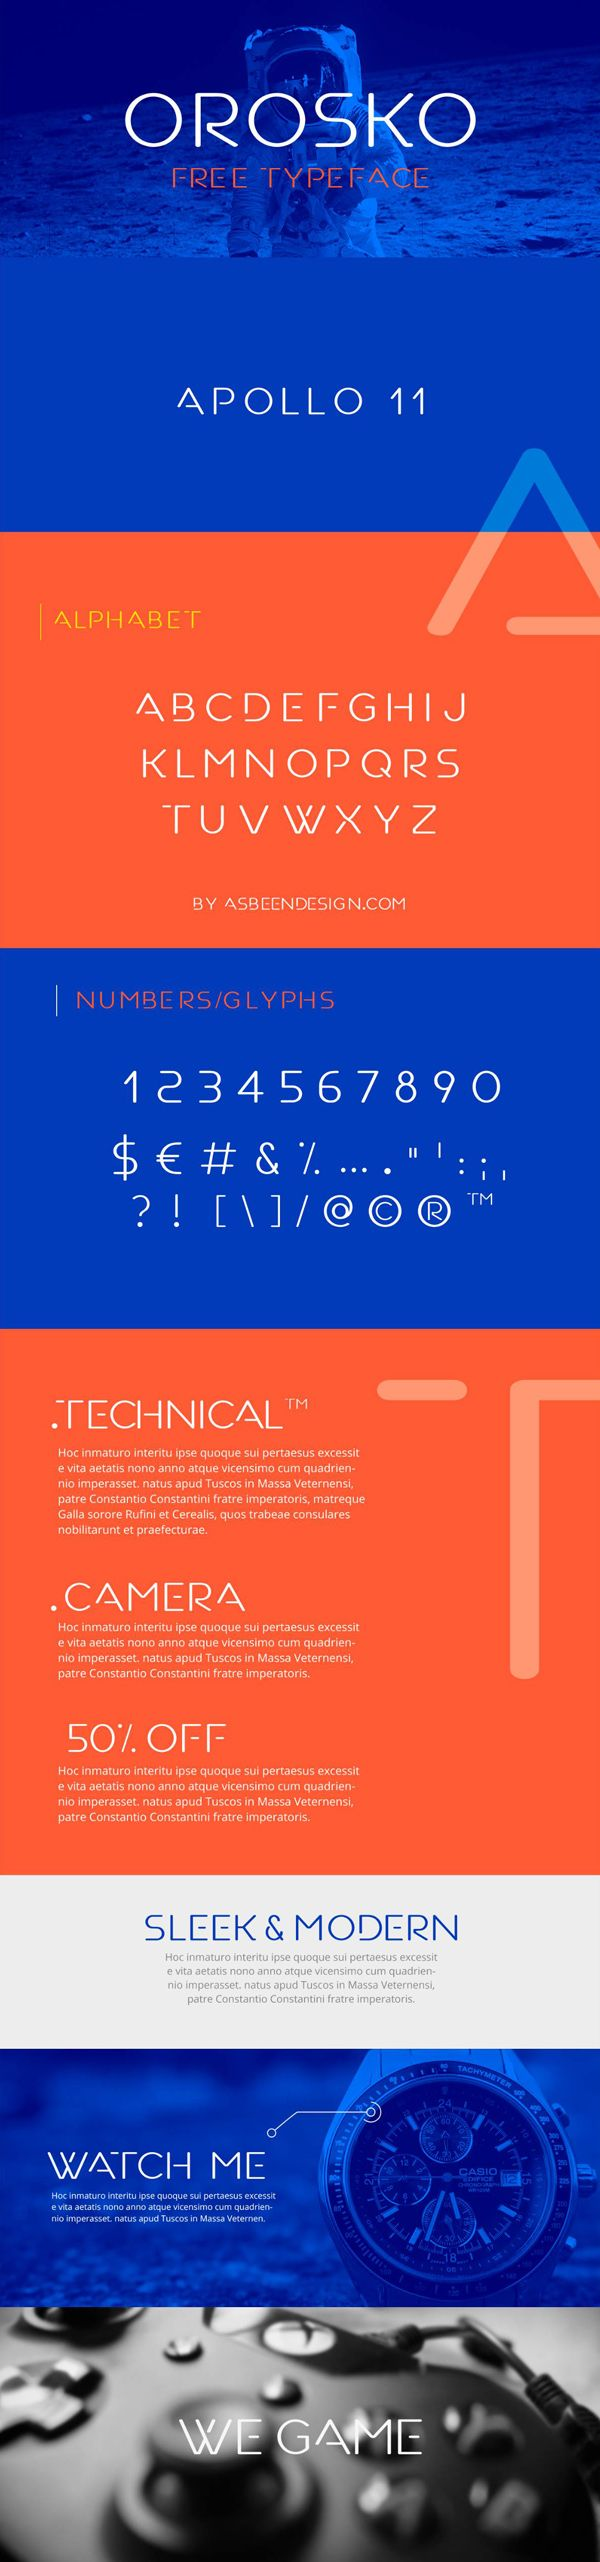 Orosko Typeface - Free Download